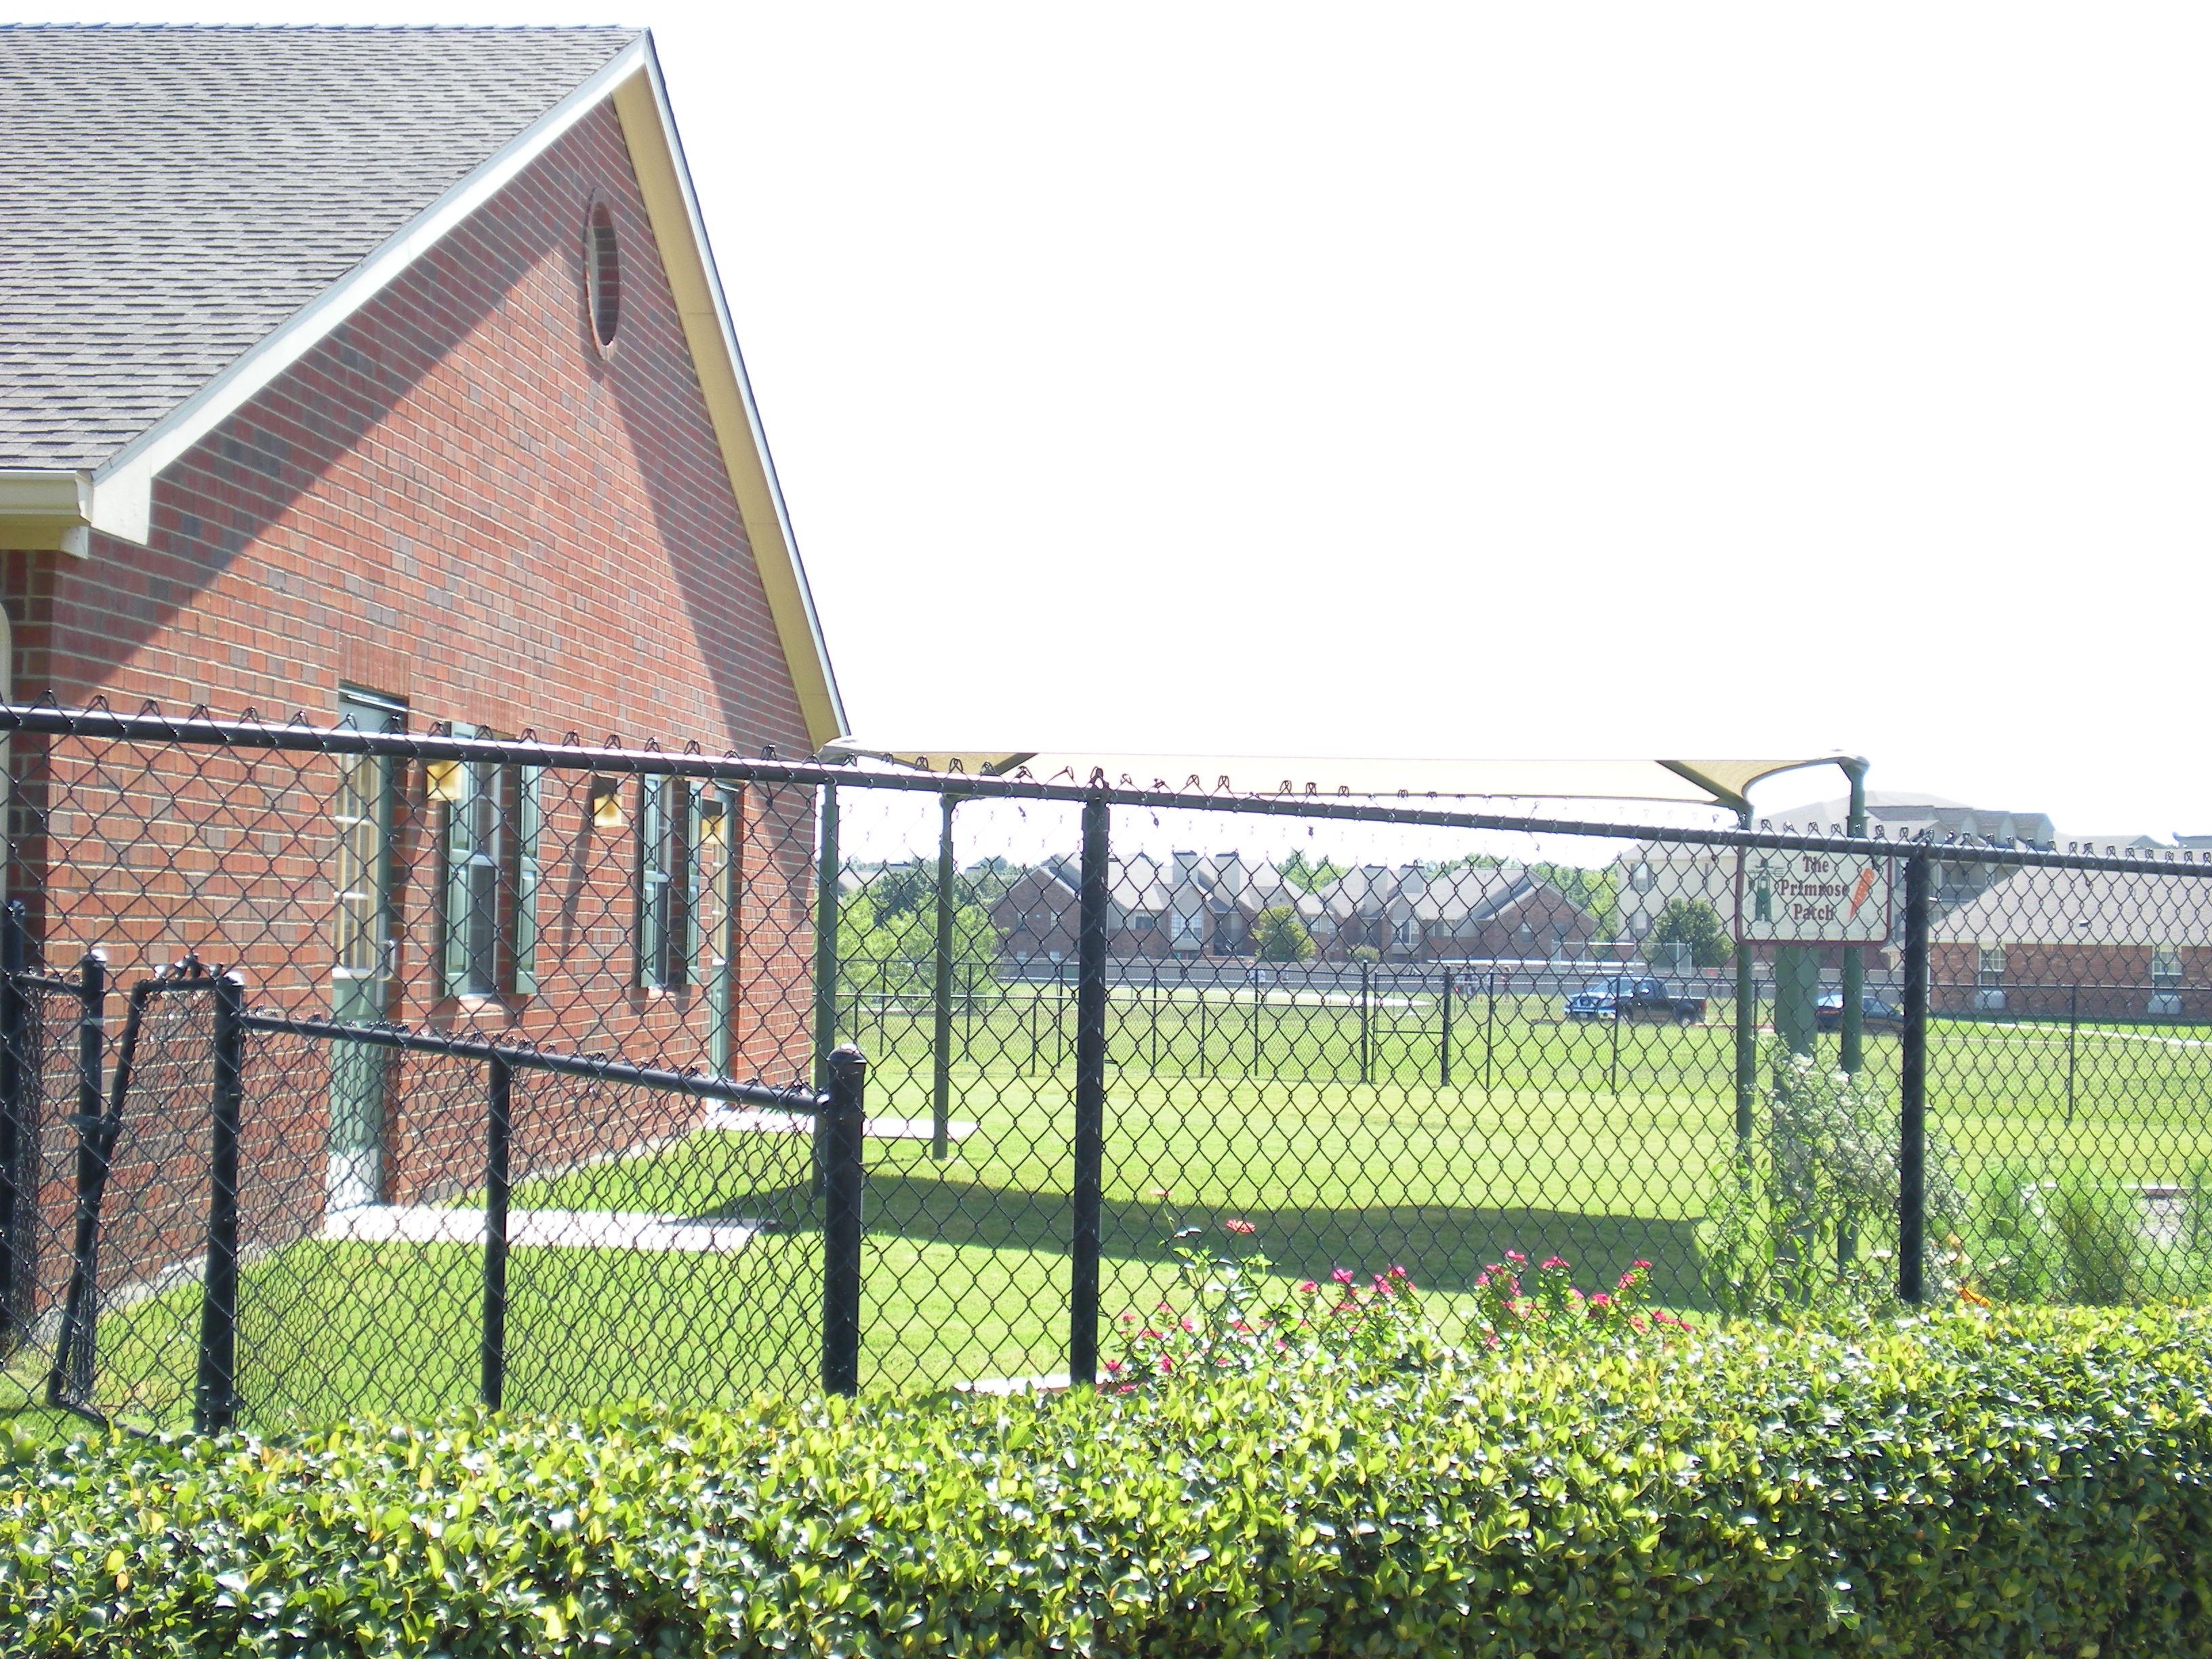 Primrose School of North Lewisville image 7